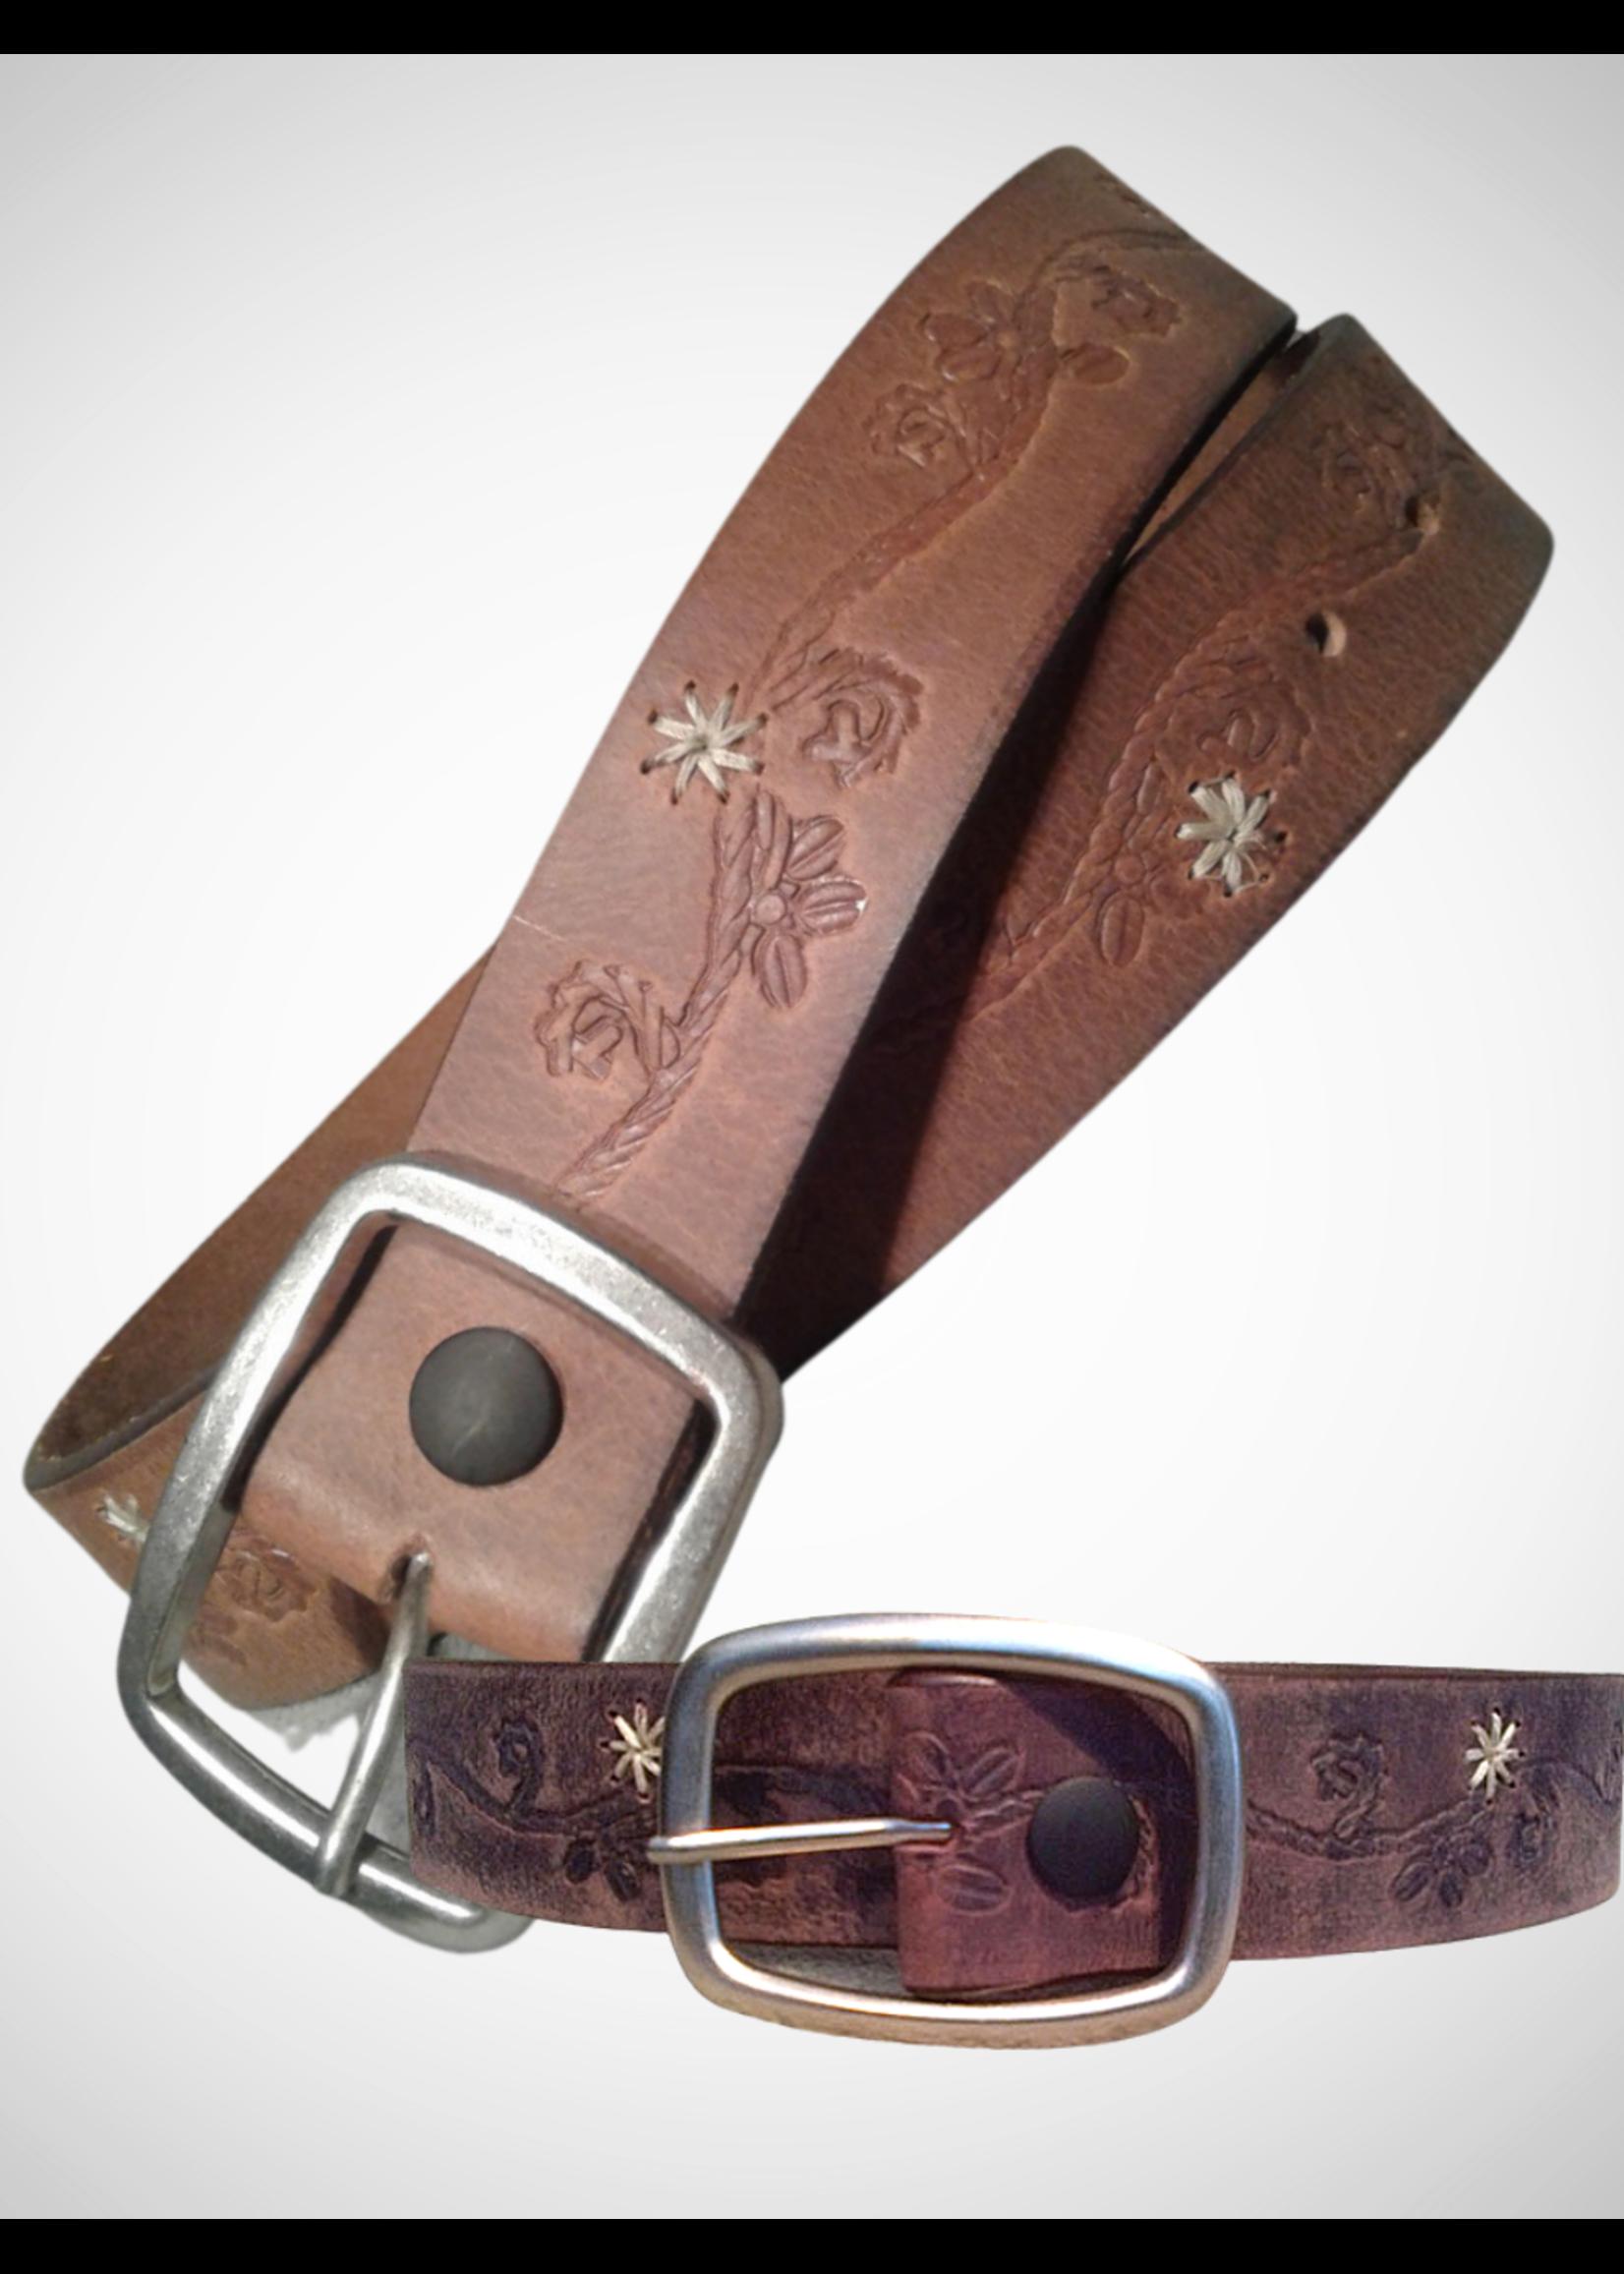 Distressed Floral Leather Belt. 40mm